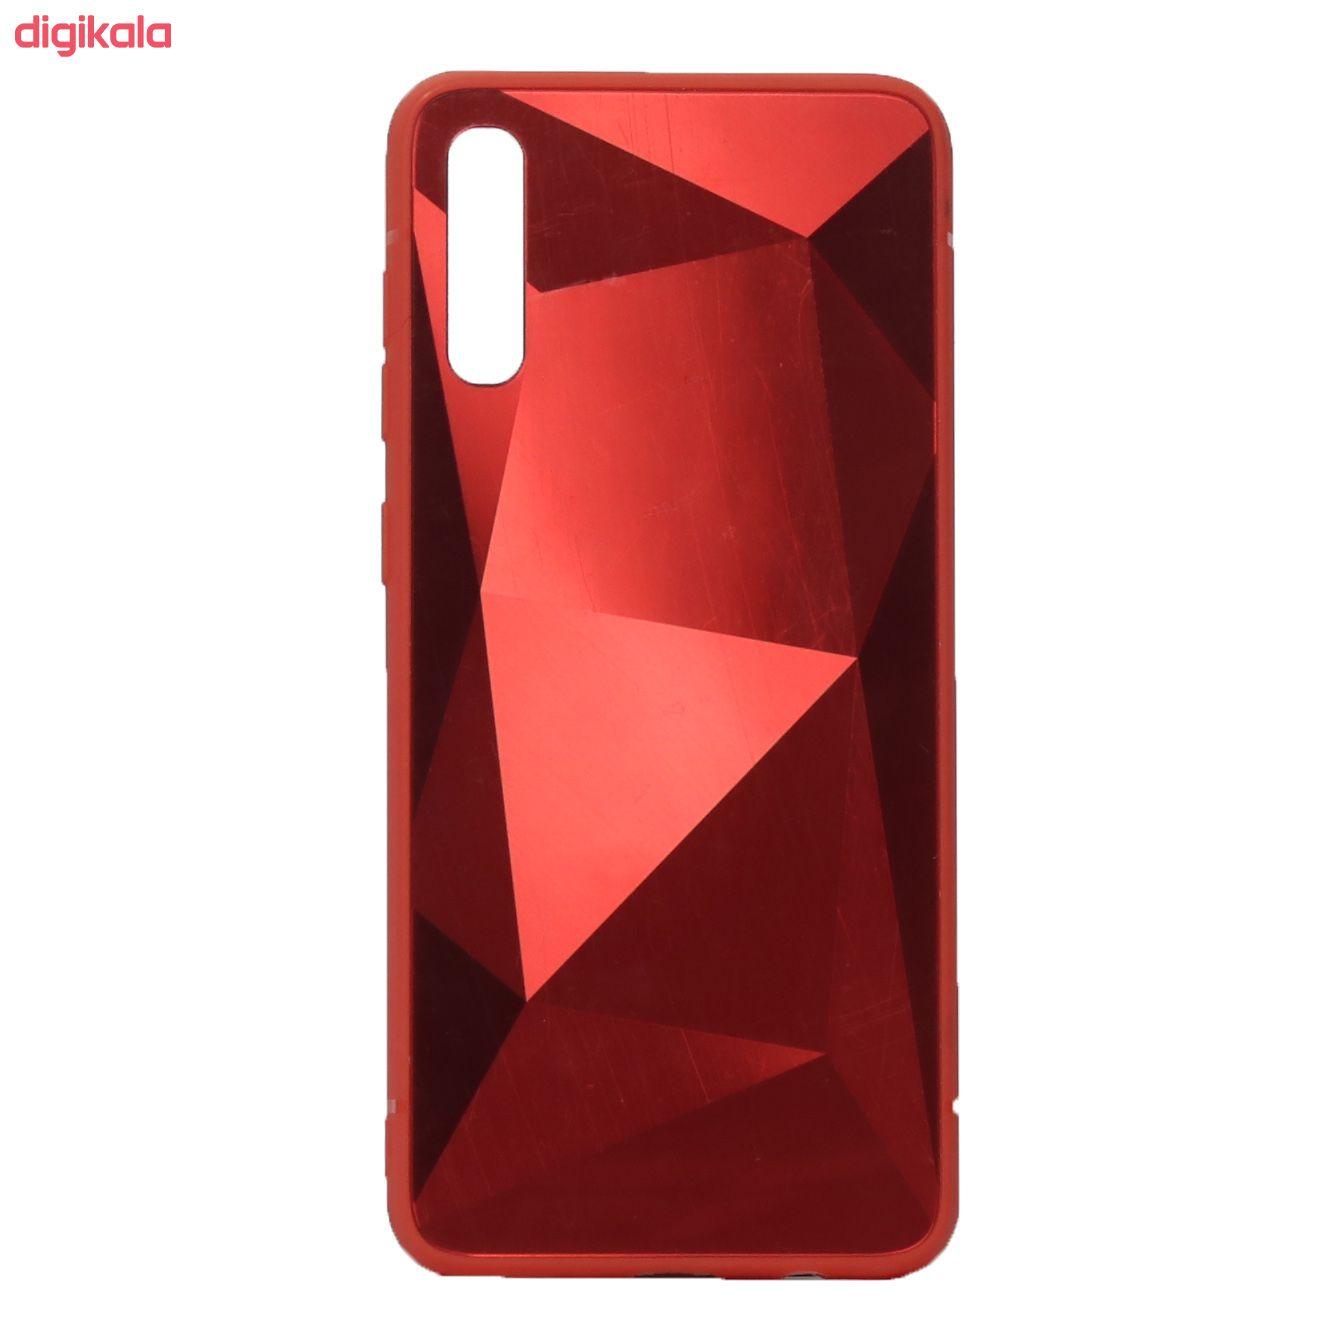 کاور طرح الماس مدل mr-506 مناسب برای گوشی موبایل سامسونگ Galaxy A50/A50s/a30s main 1 2